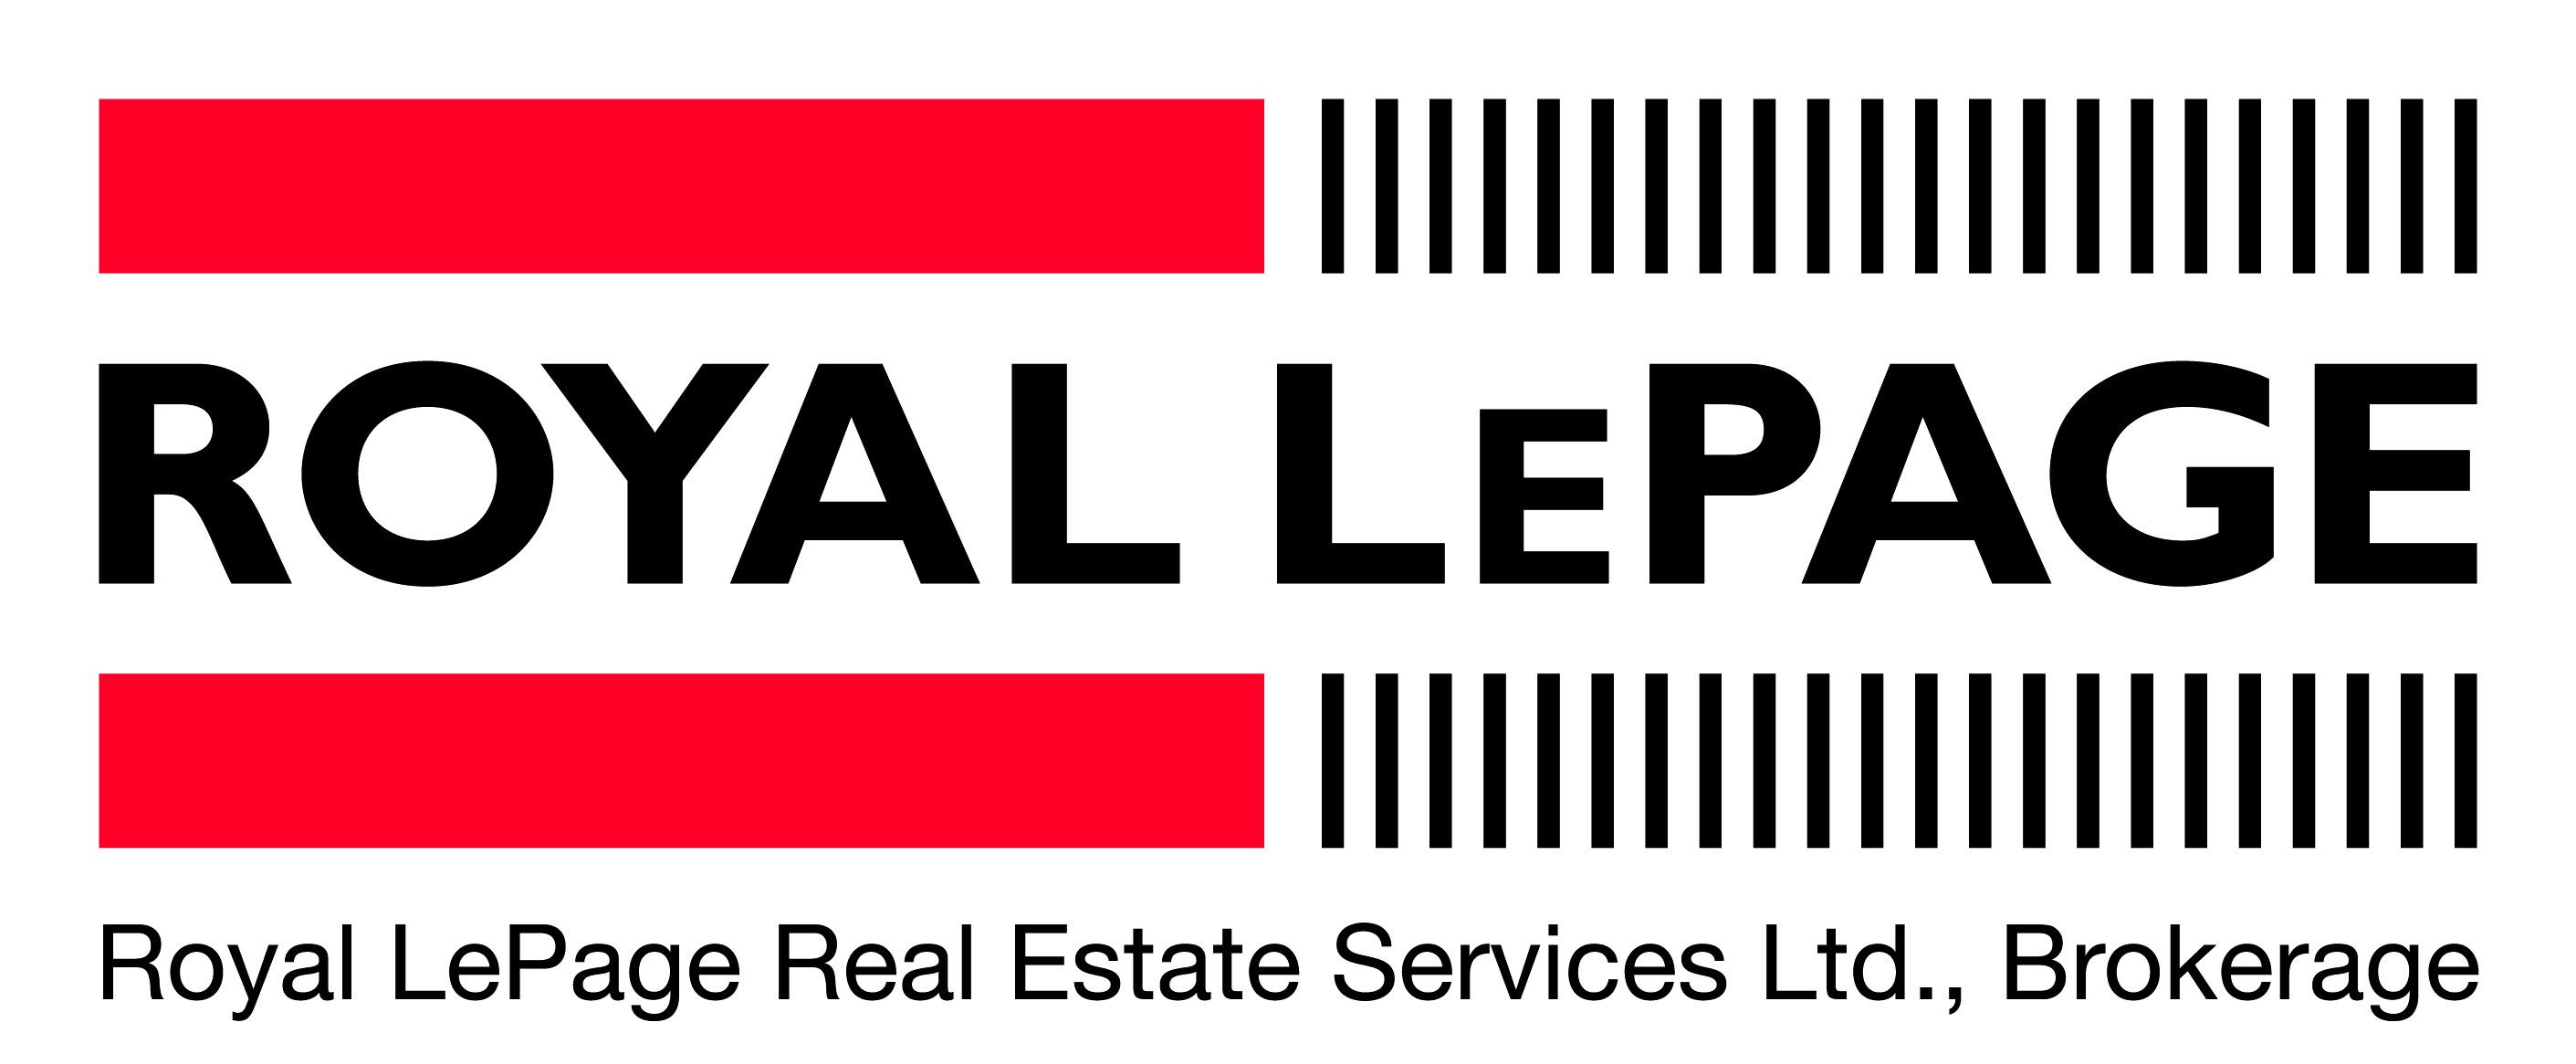 Royal LePage Real Estate Services